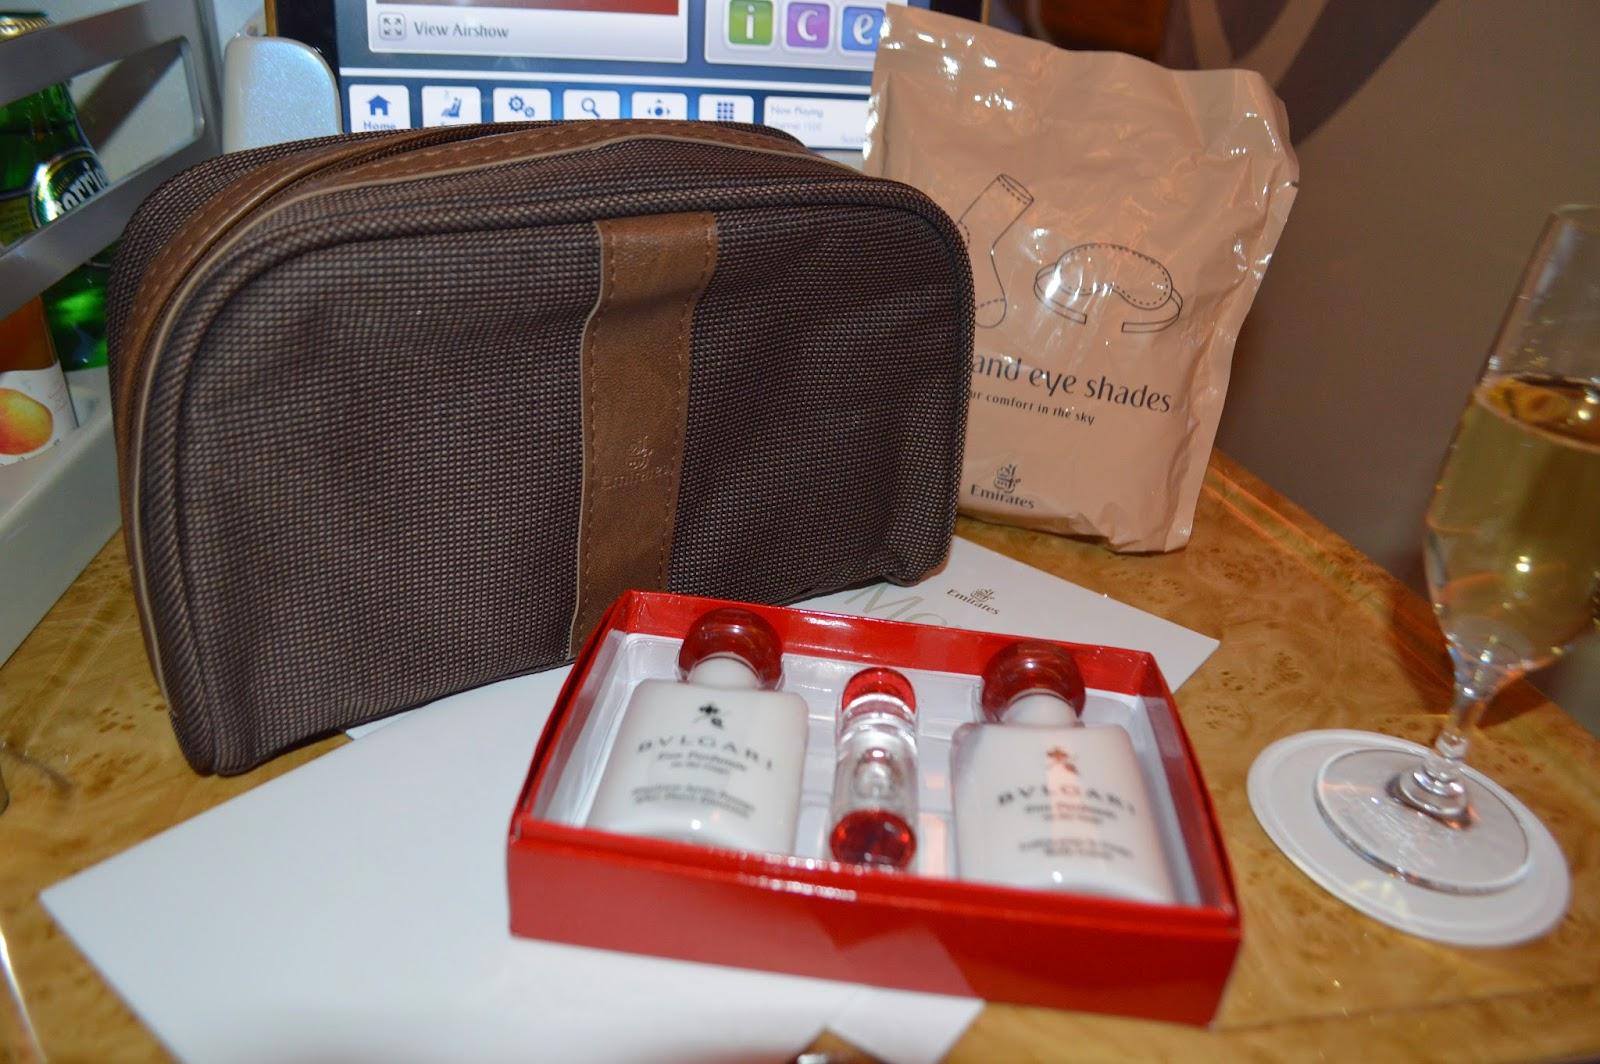 Emirates Economy Class Amenity Kit Aussie Flyer: Emirates...